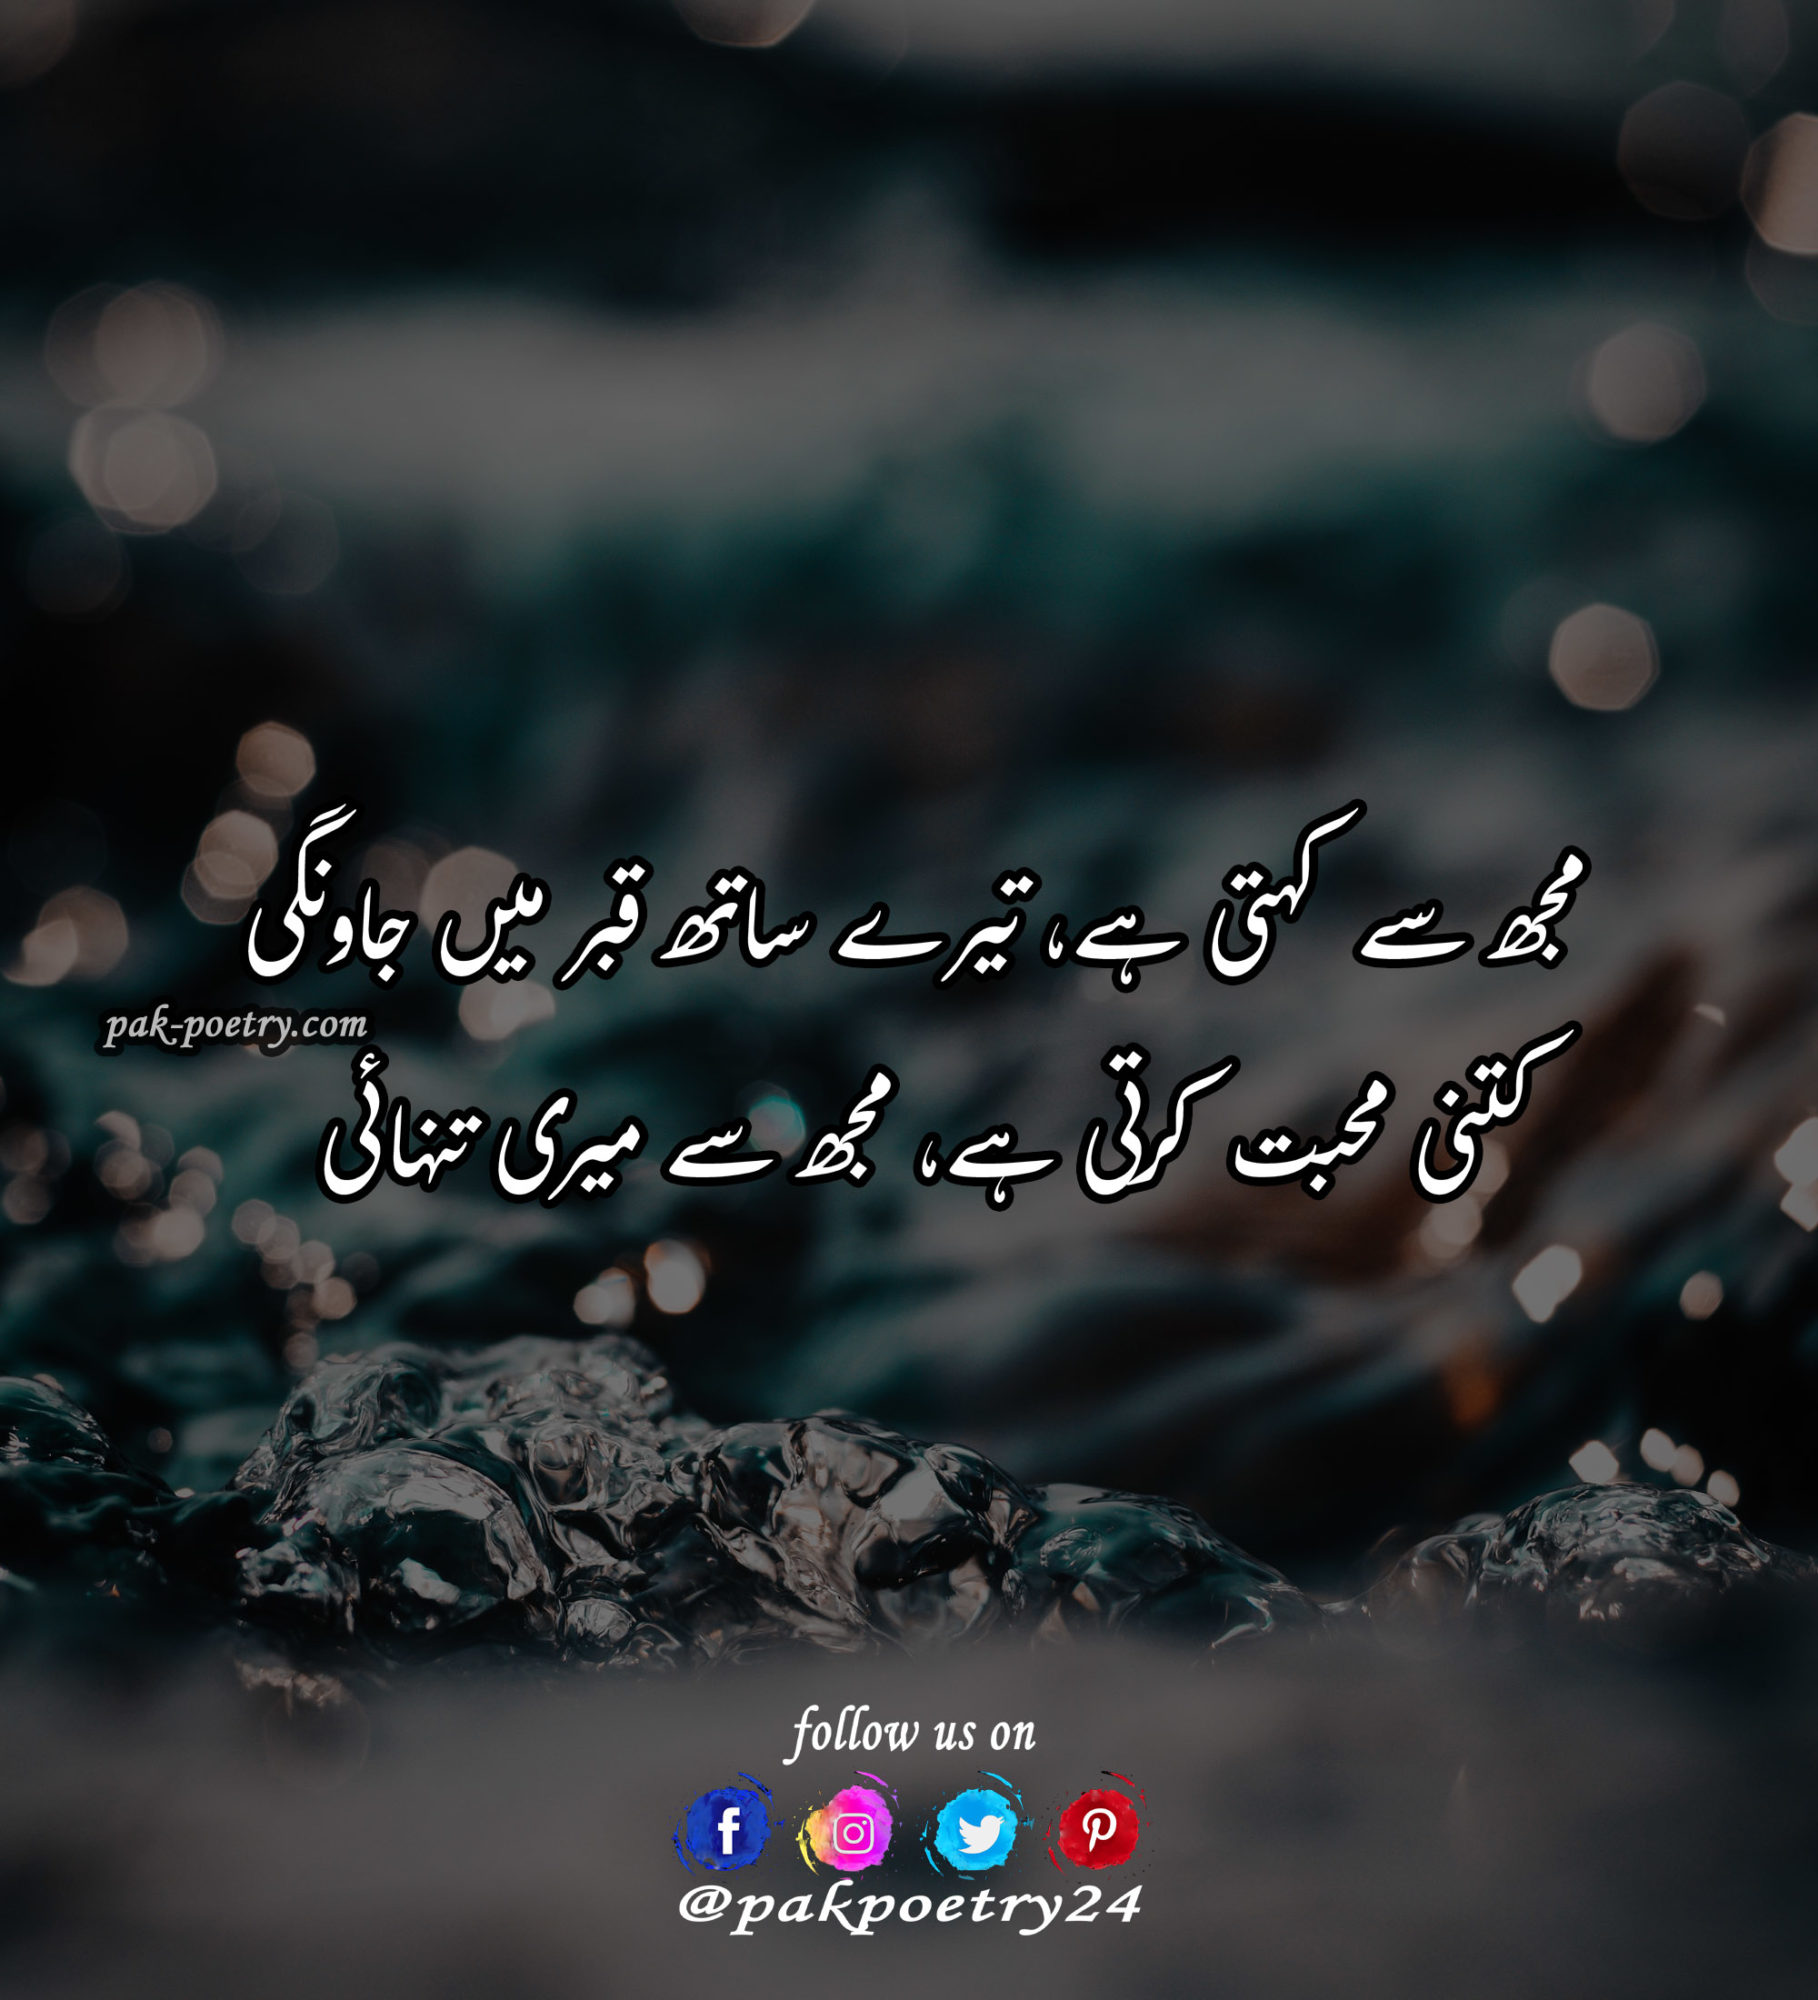 poetry in urdu, sad poetry in urdu, poetry urdu, sad poetry urdu, poetry in urdu sad, urdu sad poetry, sad best urdu poetry, poetry urdu sad, sad poetry, sad poetry 2020, poetry in urdu 2020, sad poetry in urdu 2020, urdu poetry, poetry 2020, urdu poetry 2020, new sad poetry 2020, new poetry in urdu 2020, poetry, poetry 2020 in urdu, top urdu poetry, sad best poetry in urdu, top poetry in urdu, urdu sad poetry pics, sad poetry urdu pic, sad poetry pics in urdu, new urdu poetry 2020, sad poetry, sad poetry in urdu, poetry sad, sad poetry urdu, urdu sad poetry, urdu poetry sad, poetry in urdu sad, poetry urdu sad, poetry in urdu, yaad poetry in urdu, yaad urdu poetry, urdu shayari sad, yaad urdu shayari, sad poetry 2020, sad sad poetry, urdu sad poetry pics, yaad poetry urdu, sad poetry in urdu 2020, poetry, yaad sad poetry, poetry on yaad, sad.poetry, sad potery, sad potry, sad poetry pics in urdu,